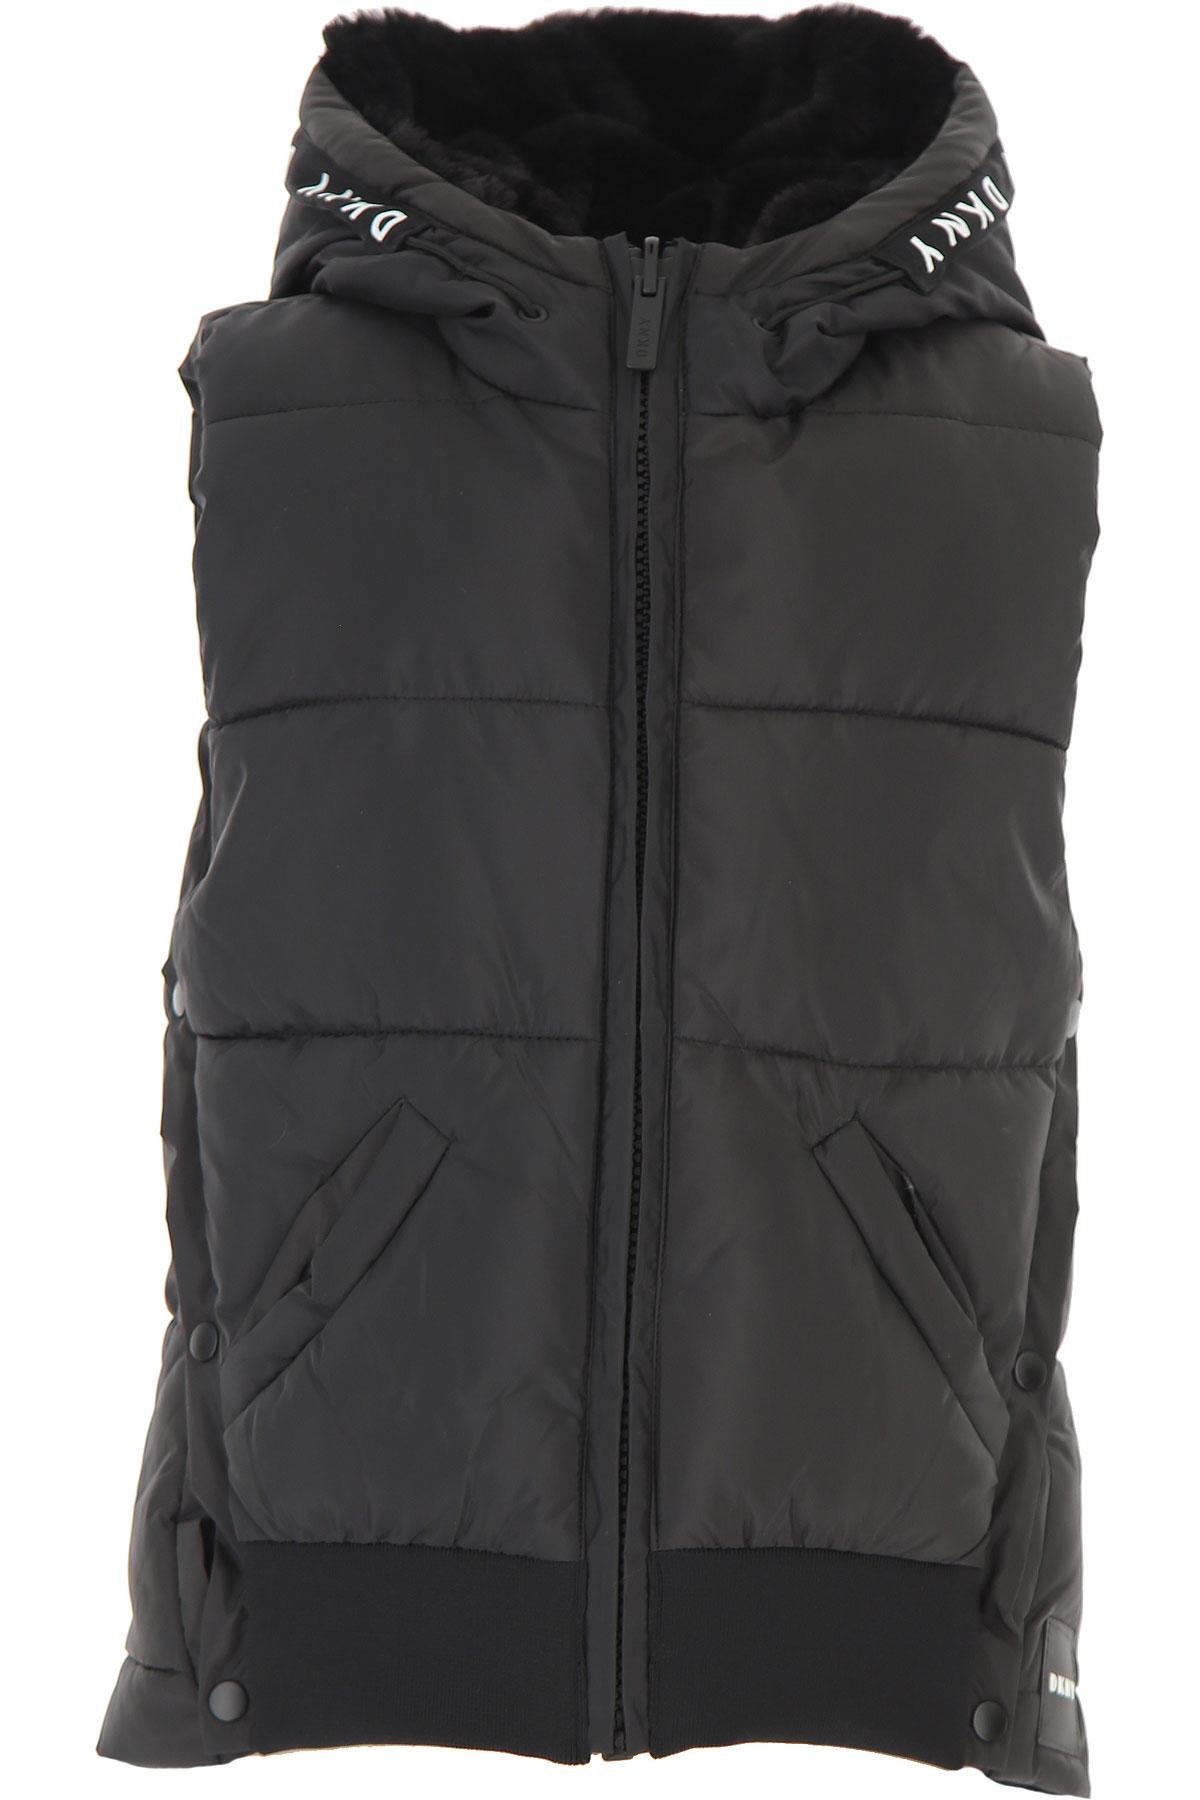 DKNY Girls Down Jacket for Kids, Puffer Ski Jacket On Sale, Black, polyester, 2019, 14Y 16Y 8Y